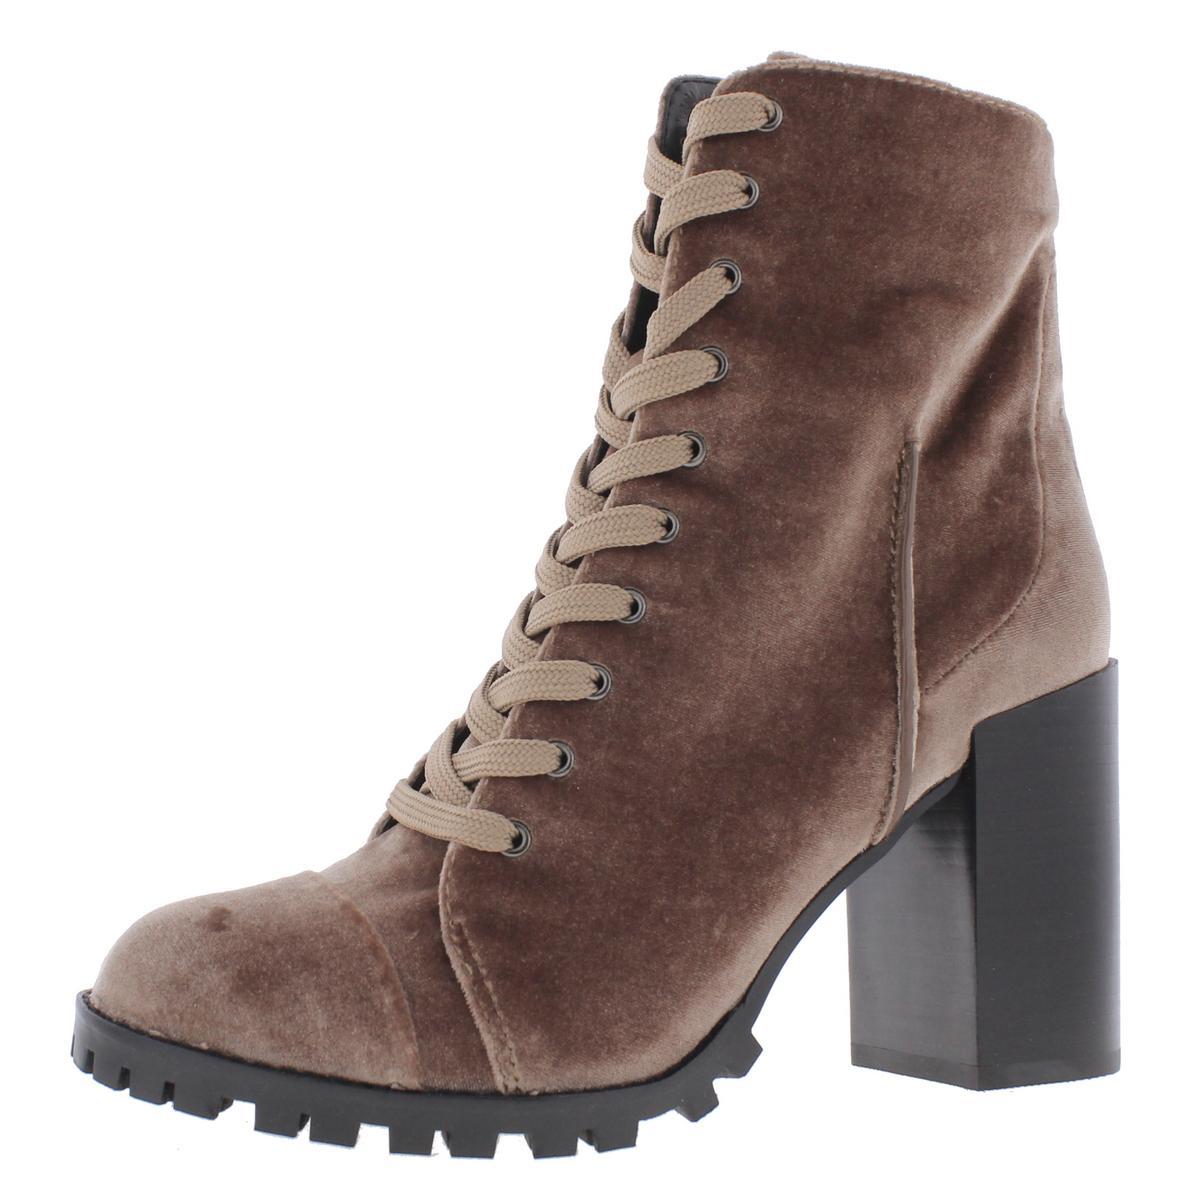 Ugg Australia Naiyah Stout Brown Boot Lace Up Shearling Lace Up women's 1016850